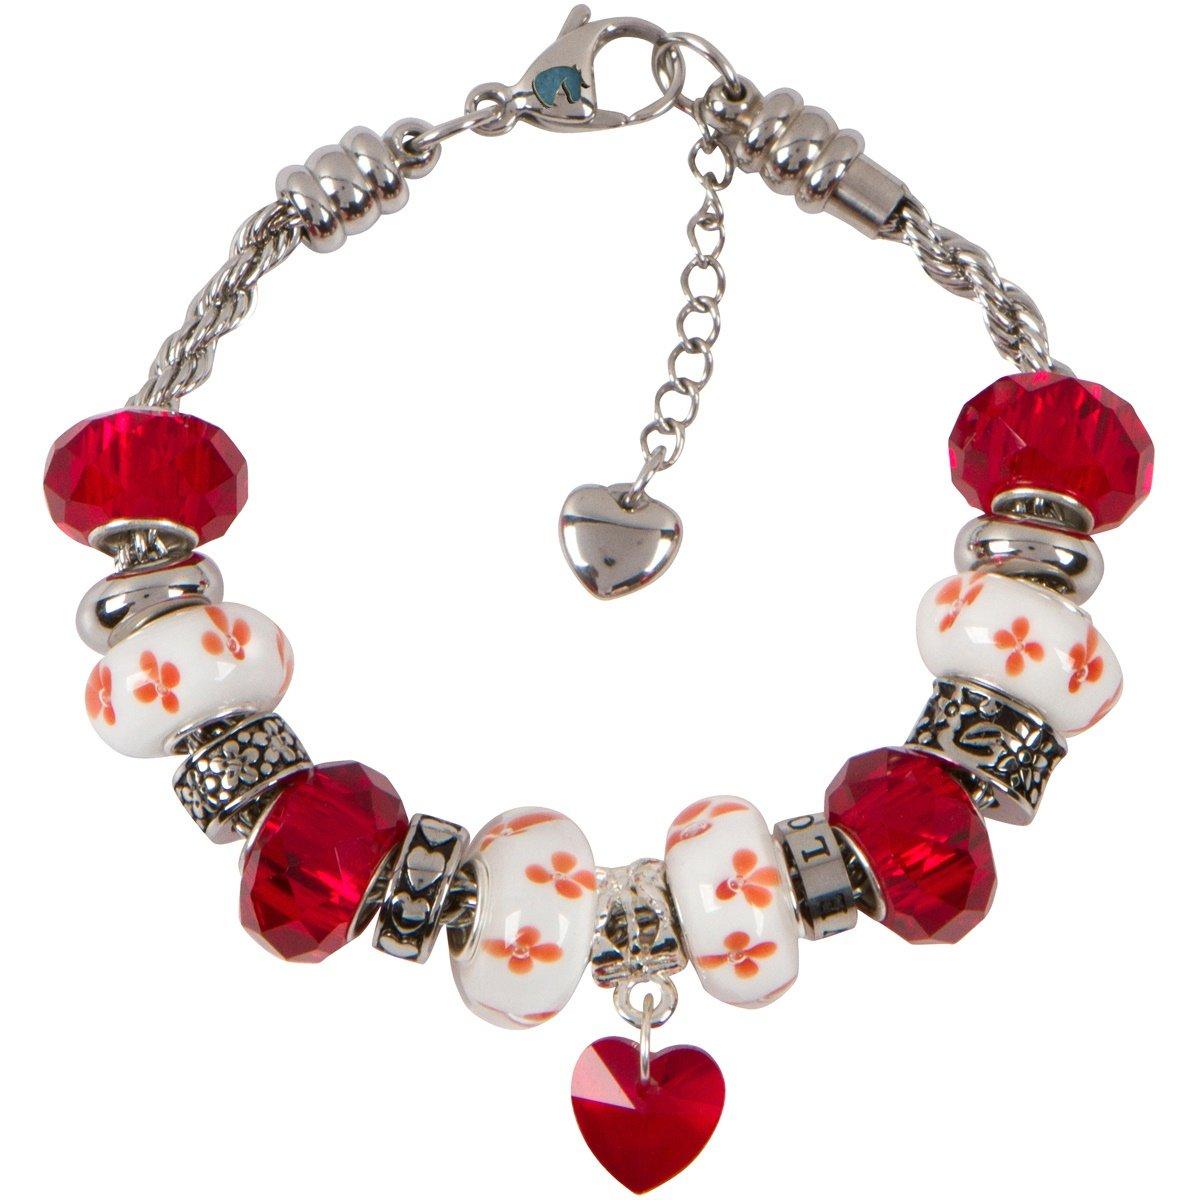 Stainless Steel Love European Bead Love Charms For European Charm Bracelets